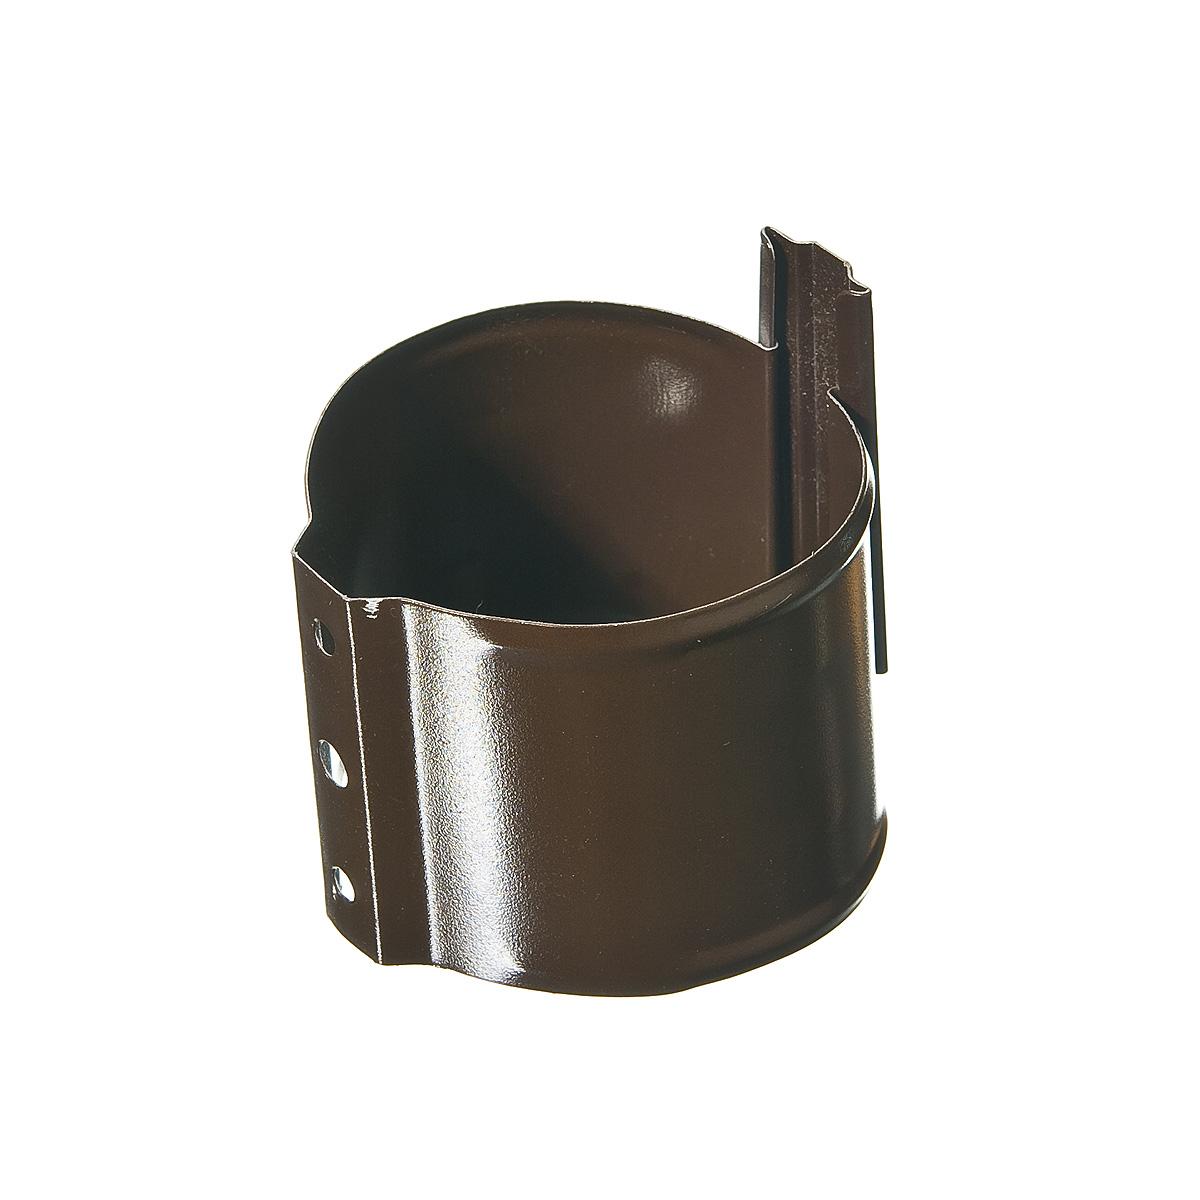 Кронштейн (хомут) трубы на кирпичную стену, металлический d90 мм коричневый с крепежом Grand Line